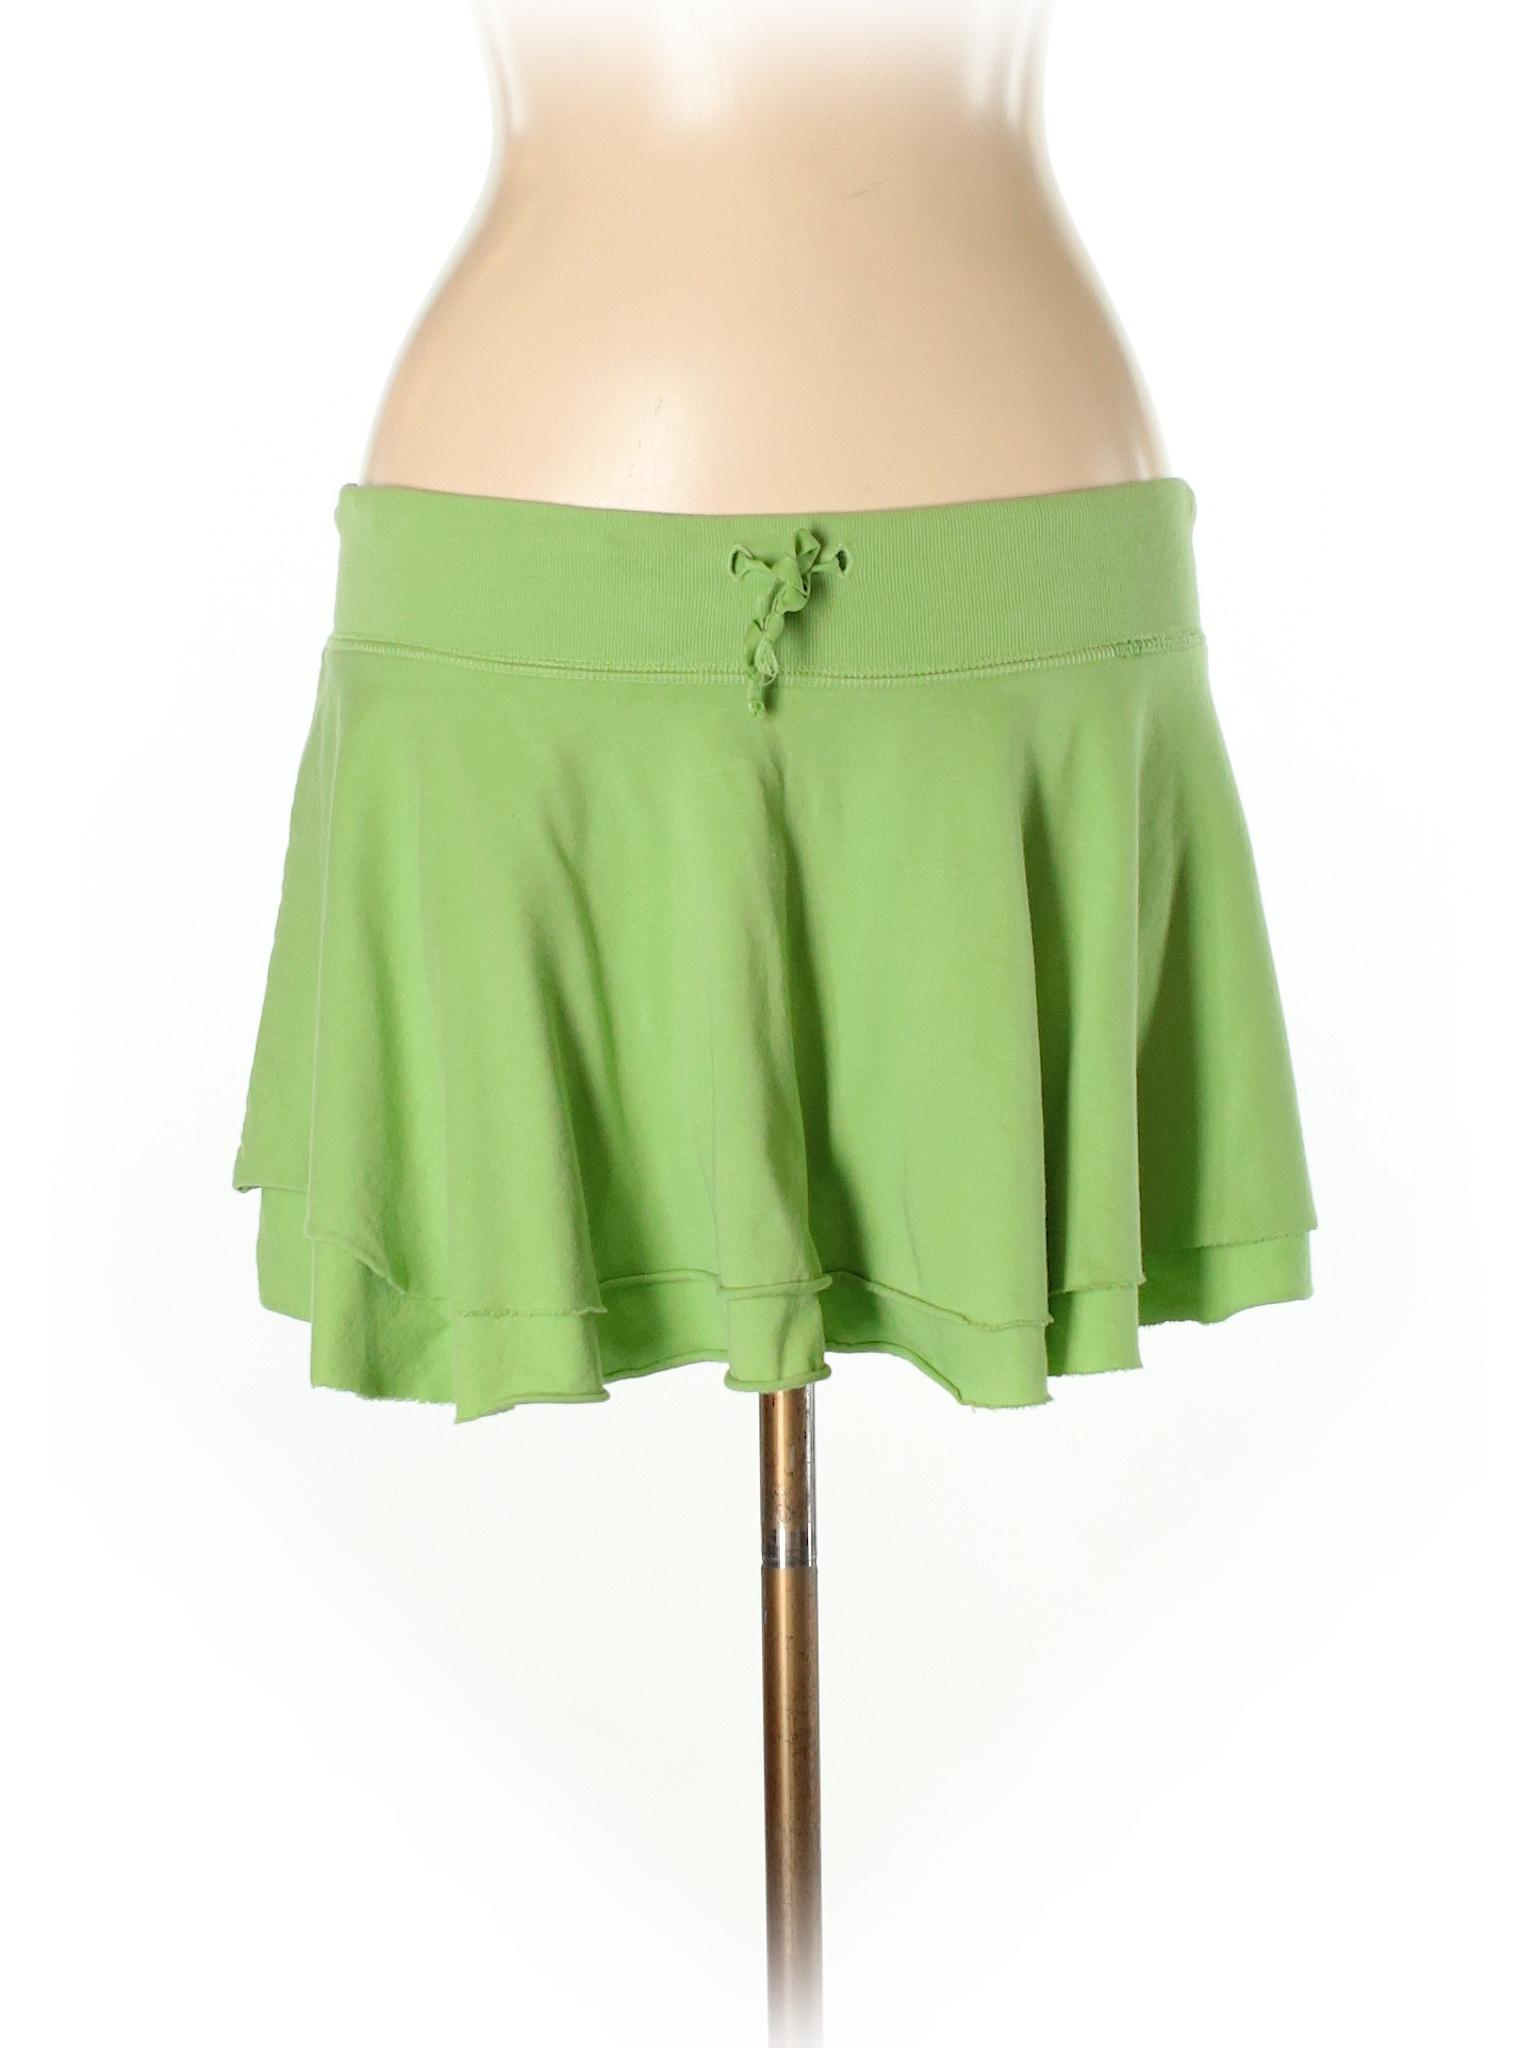 Boutique Casual Skirt Boutique Skirt Boutique Casual Casual wfBtq